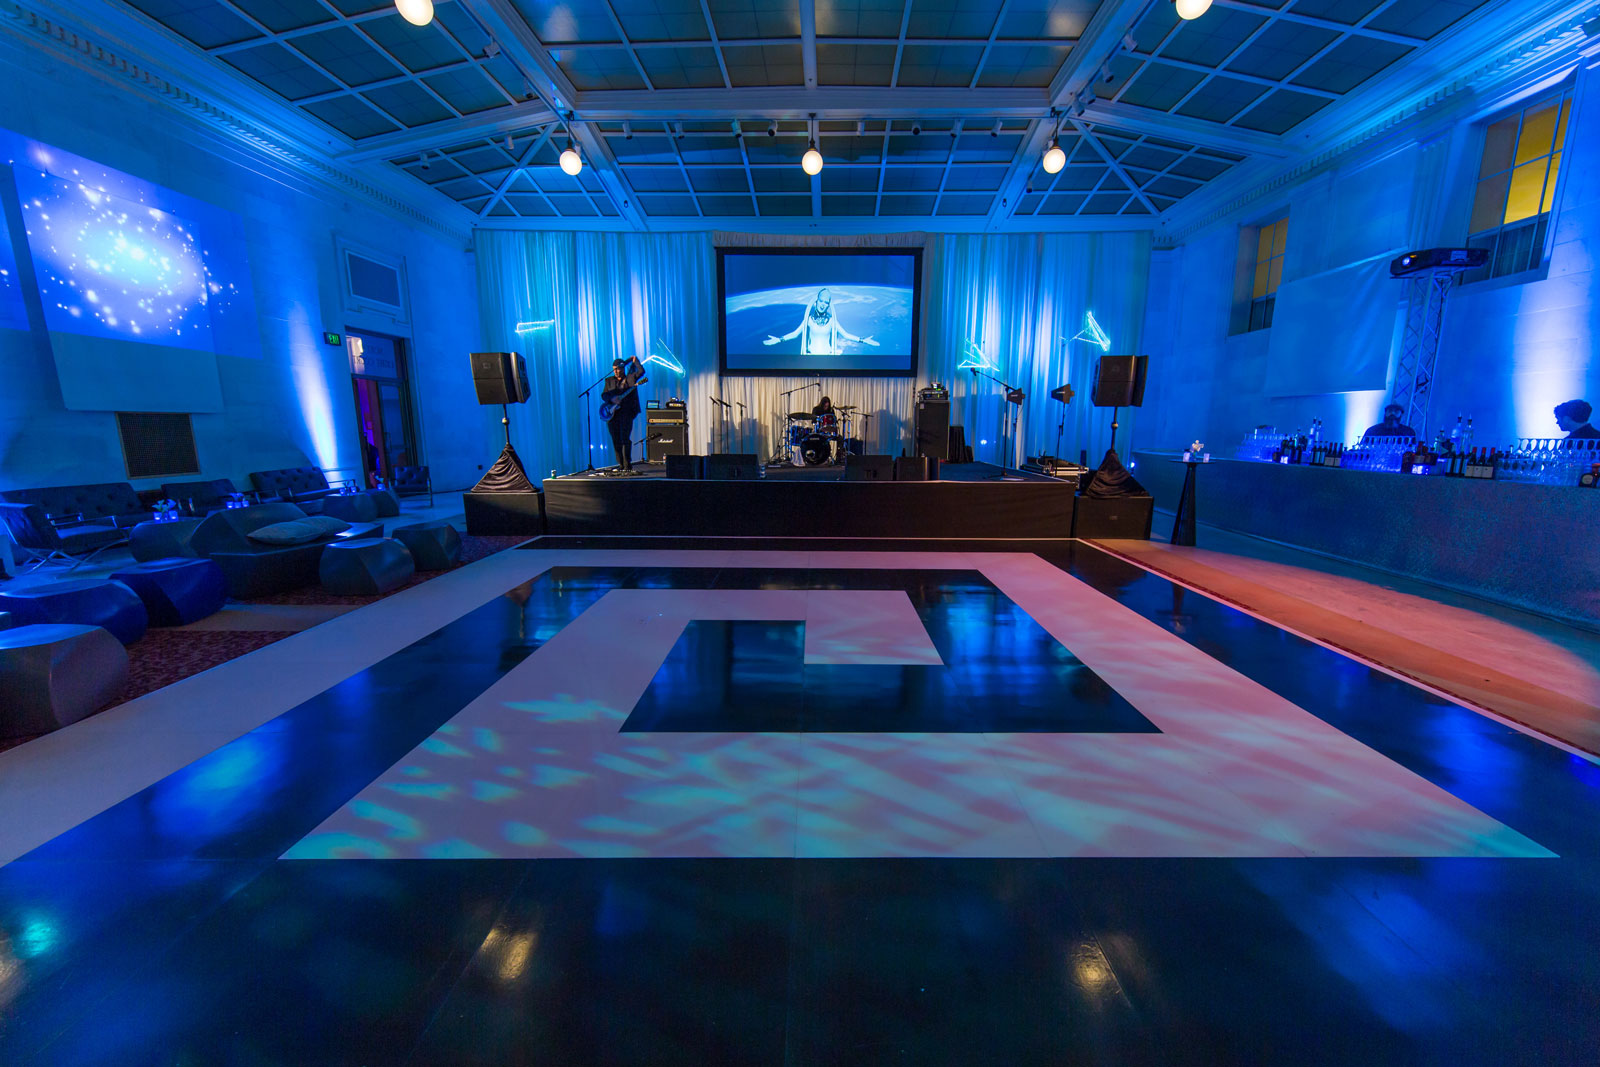 everything-audio-visual-venues-city-hall-10.jpg